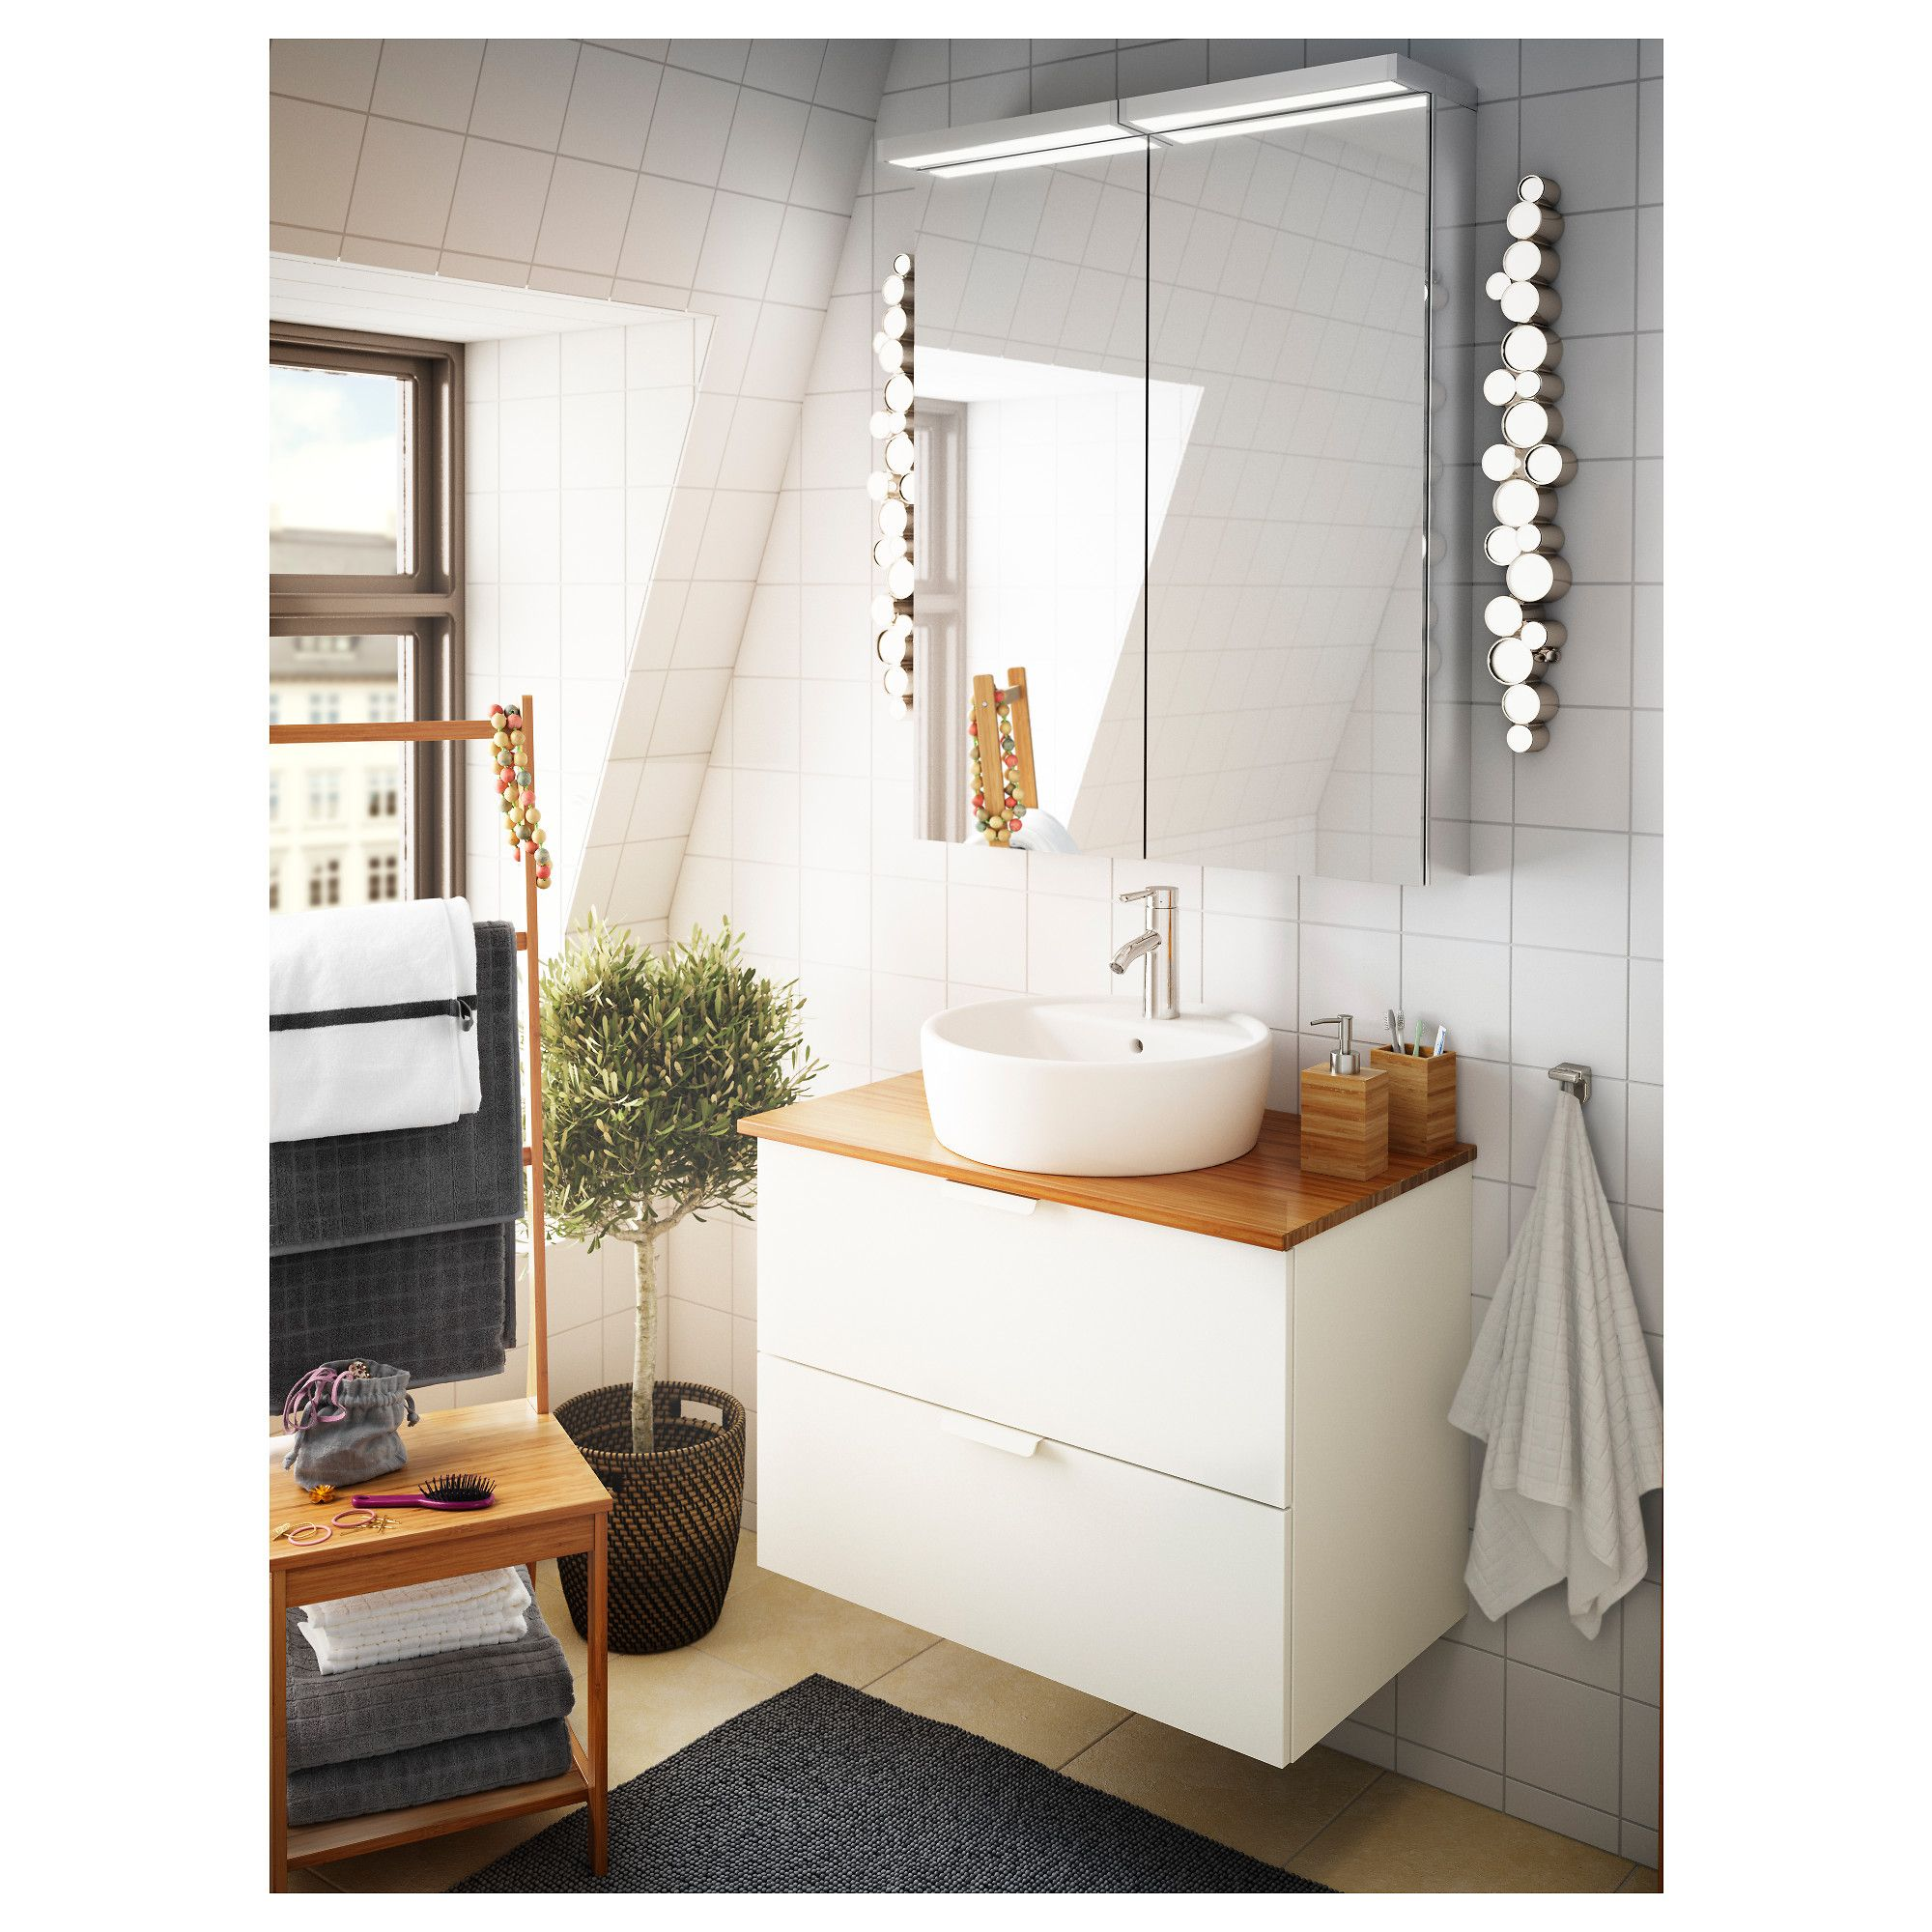 Ikea Tolken Countertop Bamboo Diy Bathroom Remodel Bathrooms